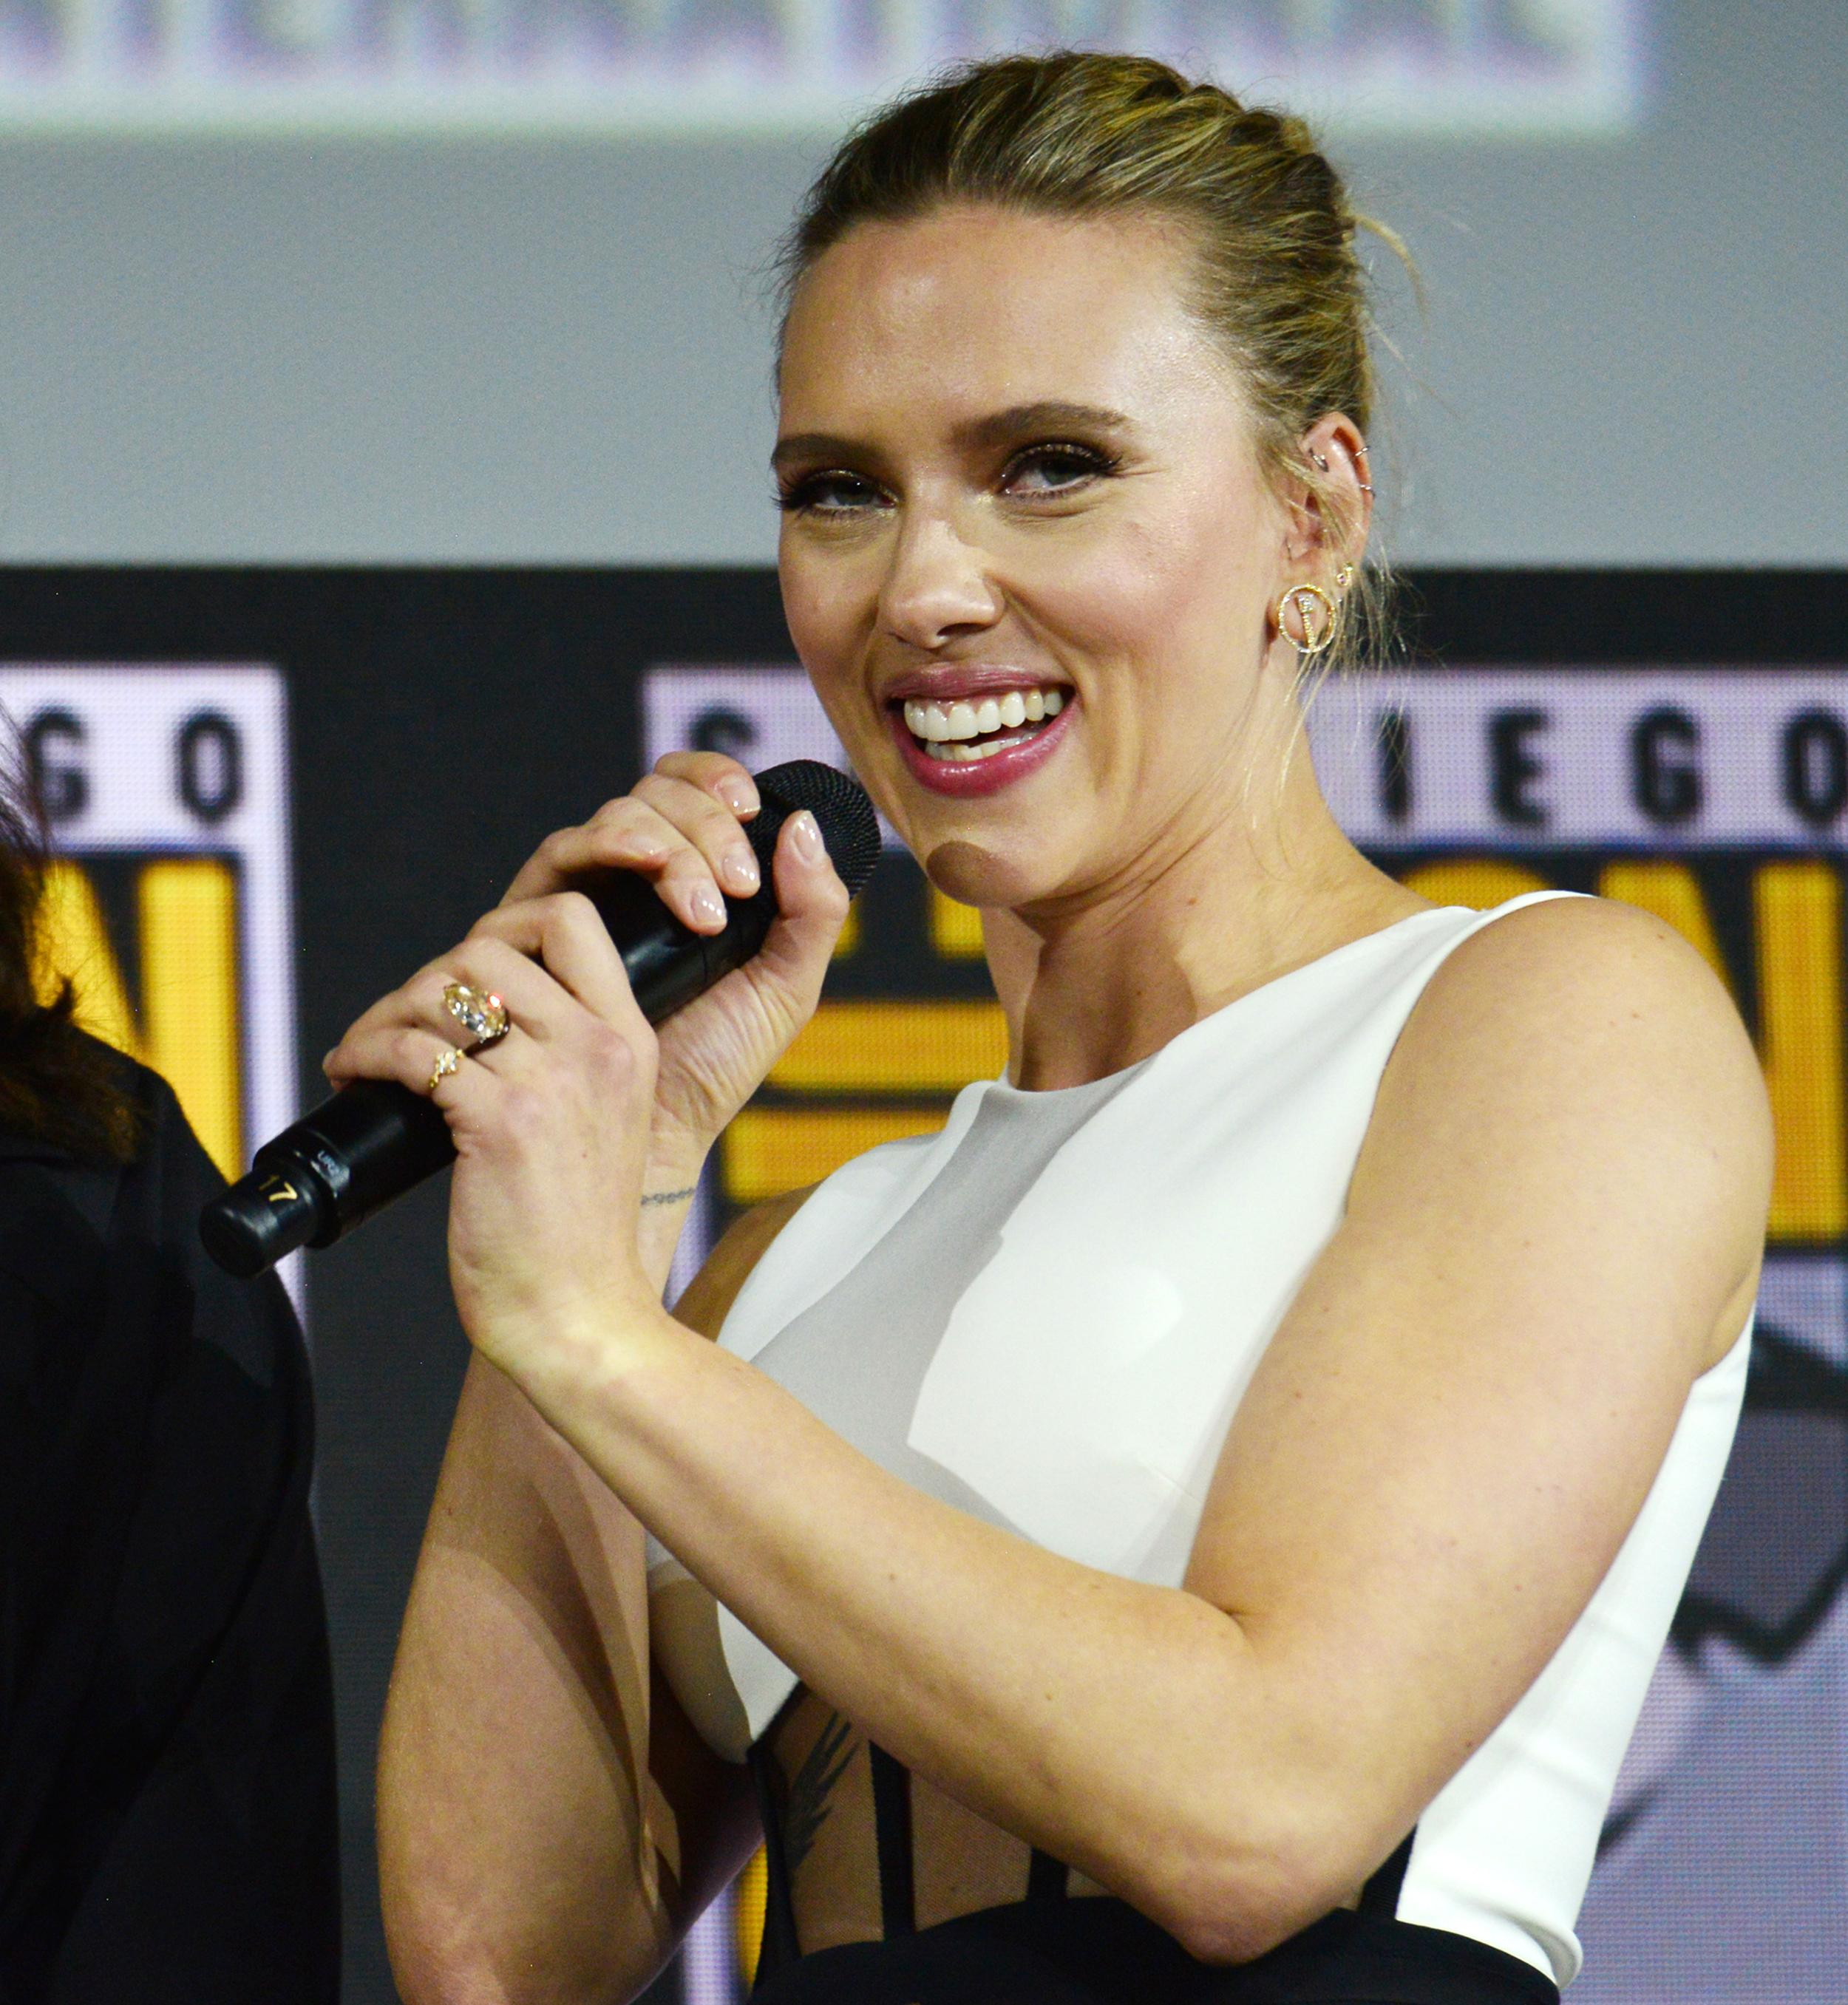 Scarlett Johansson Shows Off Massive 11 Carat Engagement Ring At Comic Con